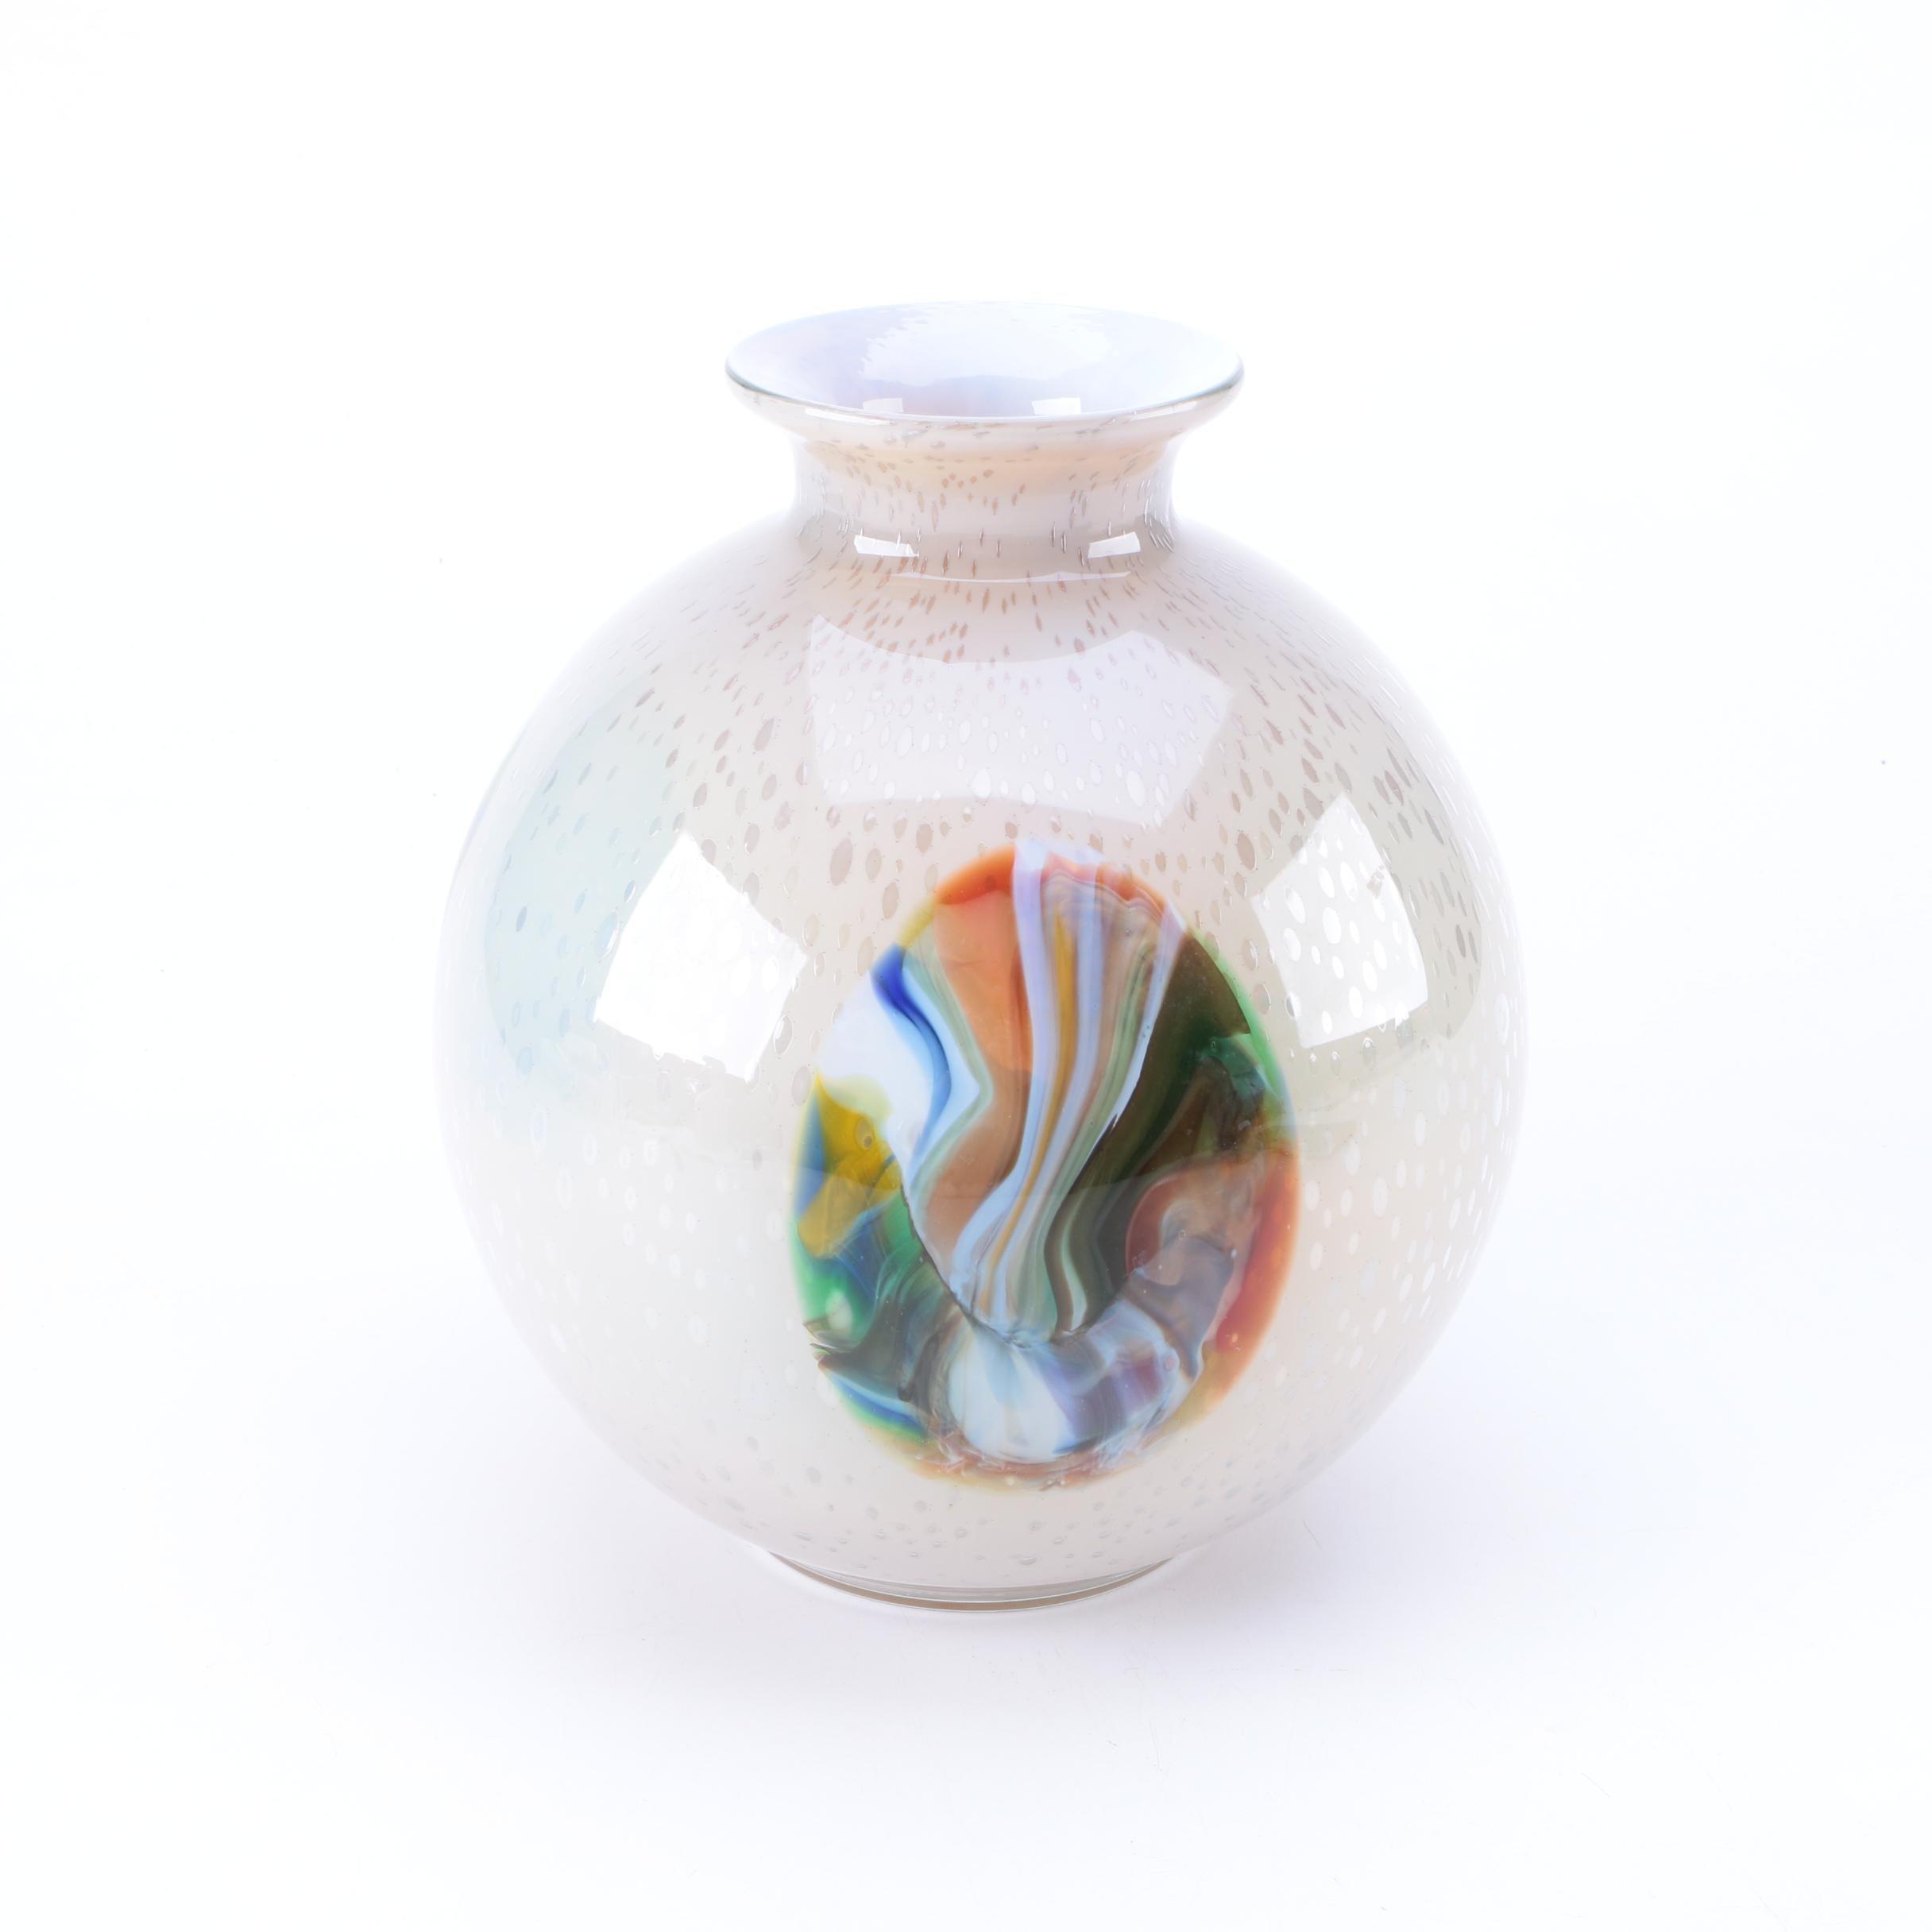 Translucent and Rainbow Art Glass Vase